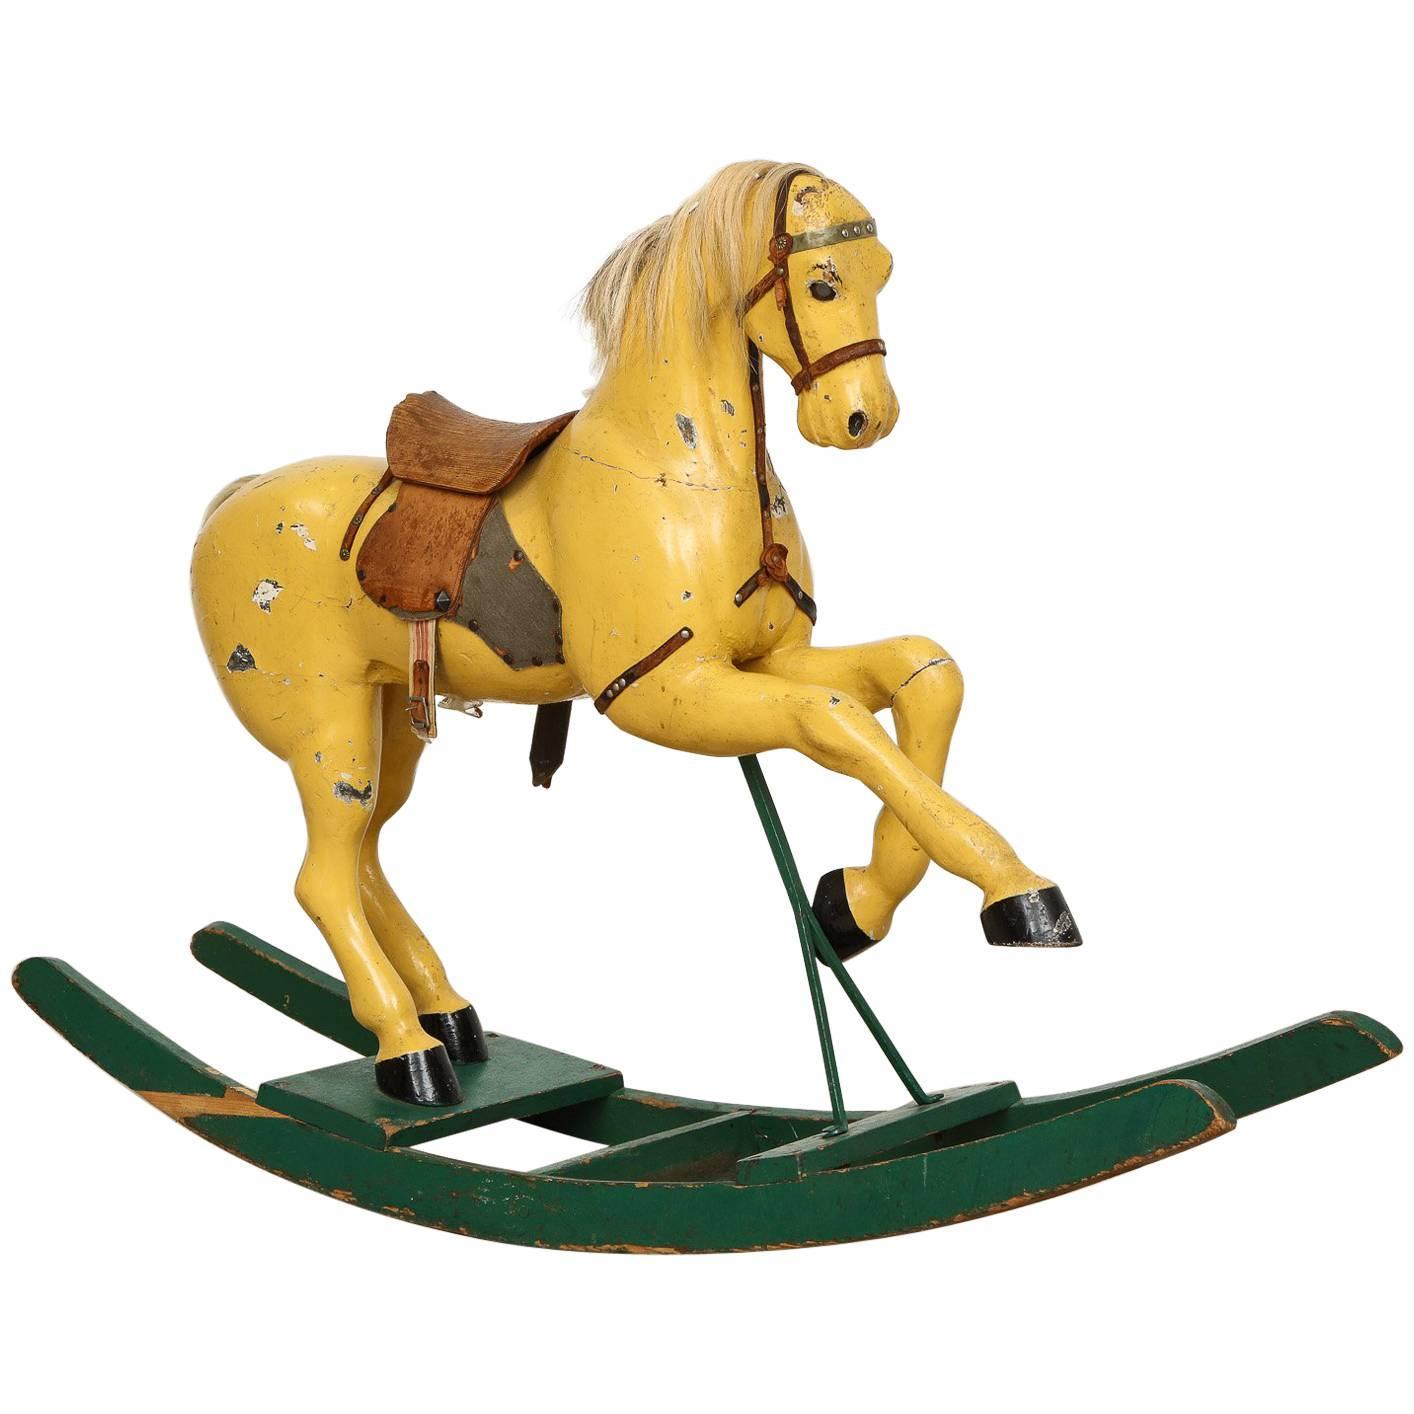 Swedish Antique Toy Rocking Horse, All Original, Origin: Sweden, Circa 1870-1900